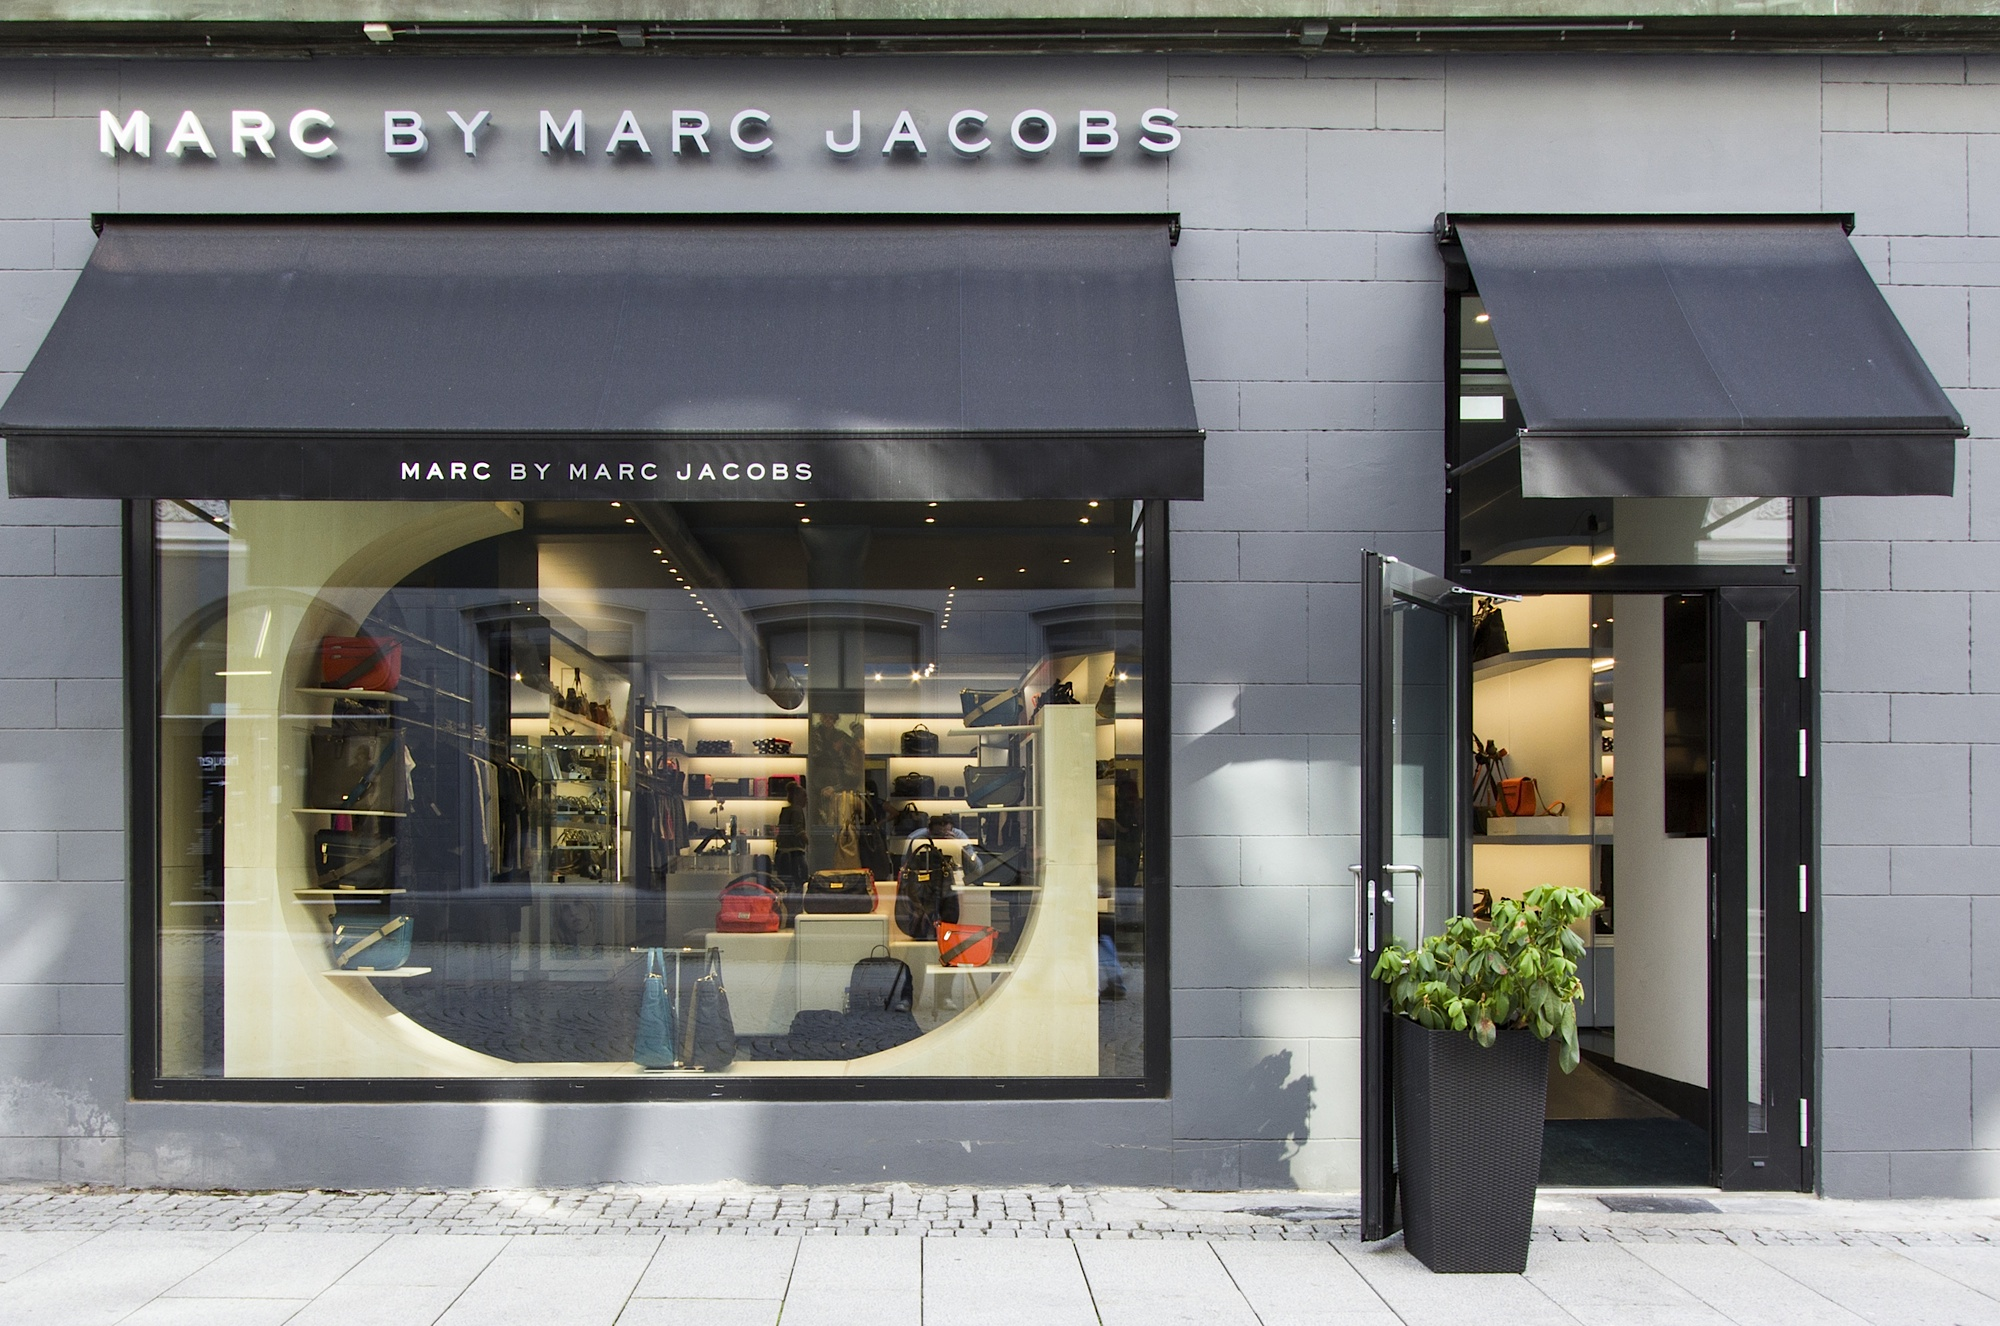 marc-jacobs-06.jpg